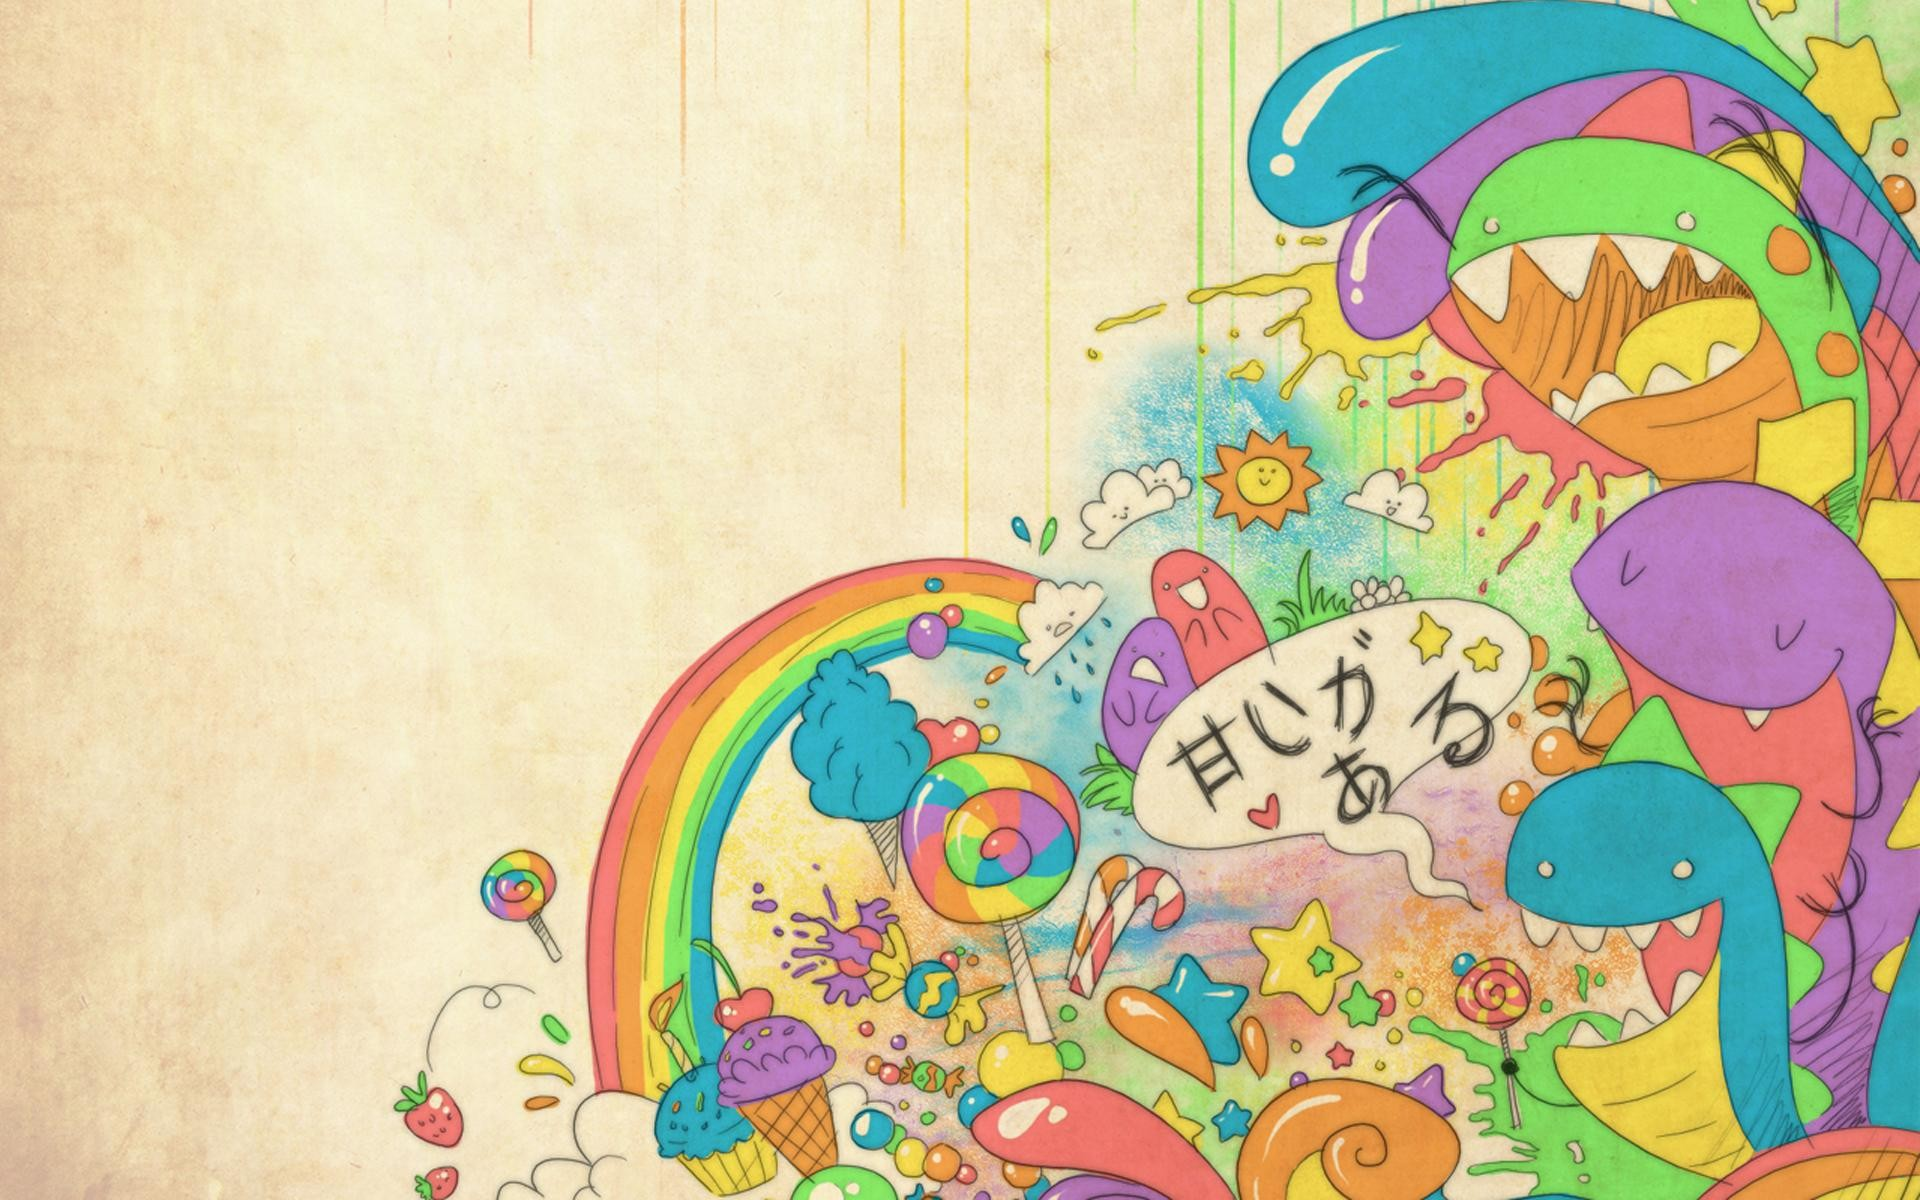 wallpaper.wiki-Colorful-Cute-Background-Wallpaper-Designs8-PIC-